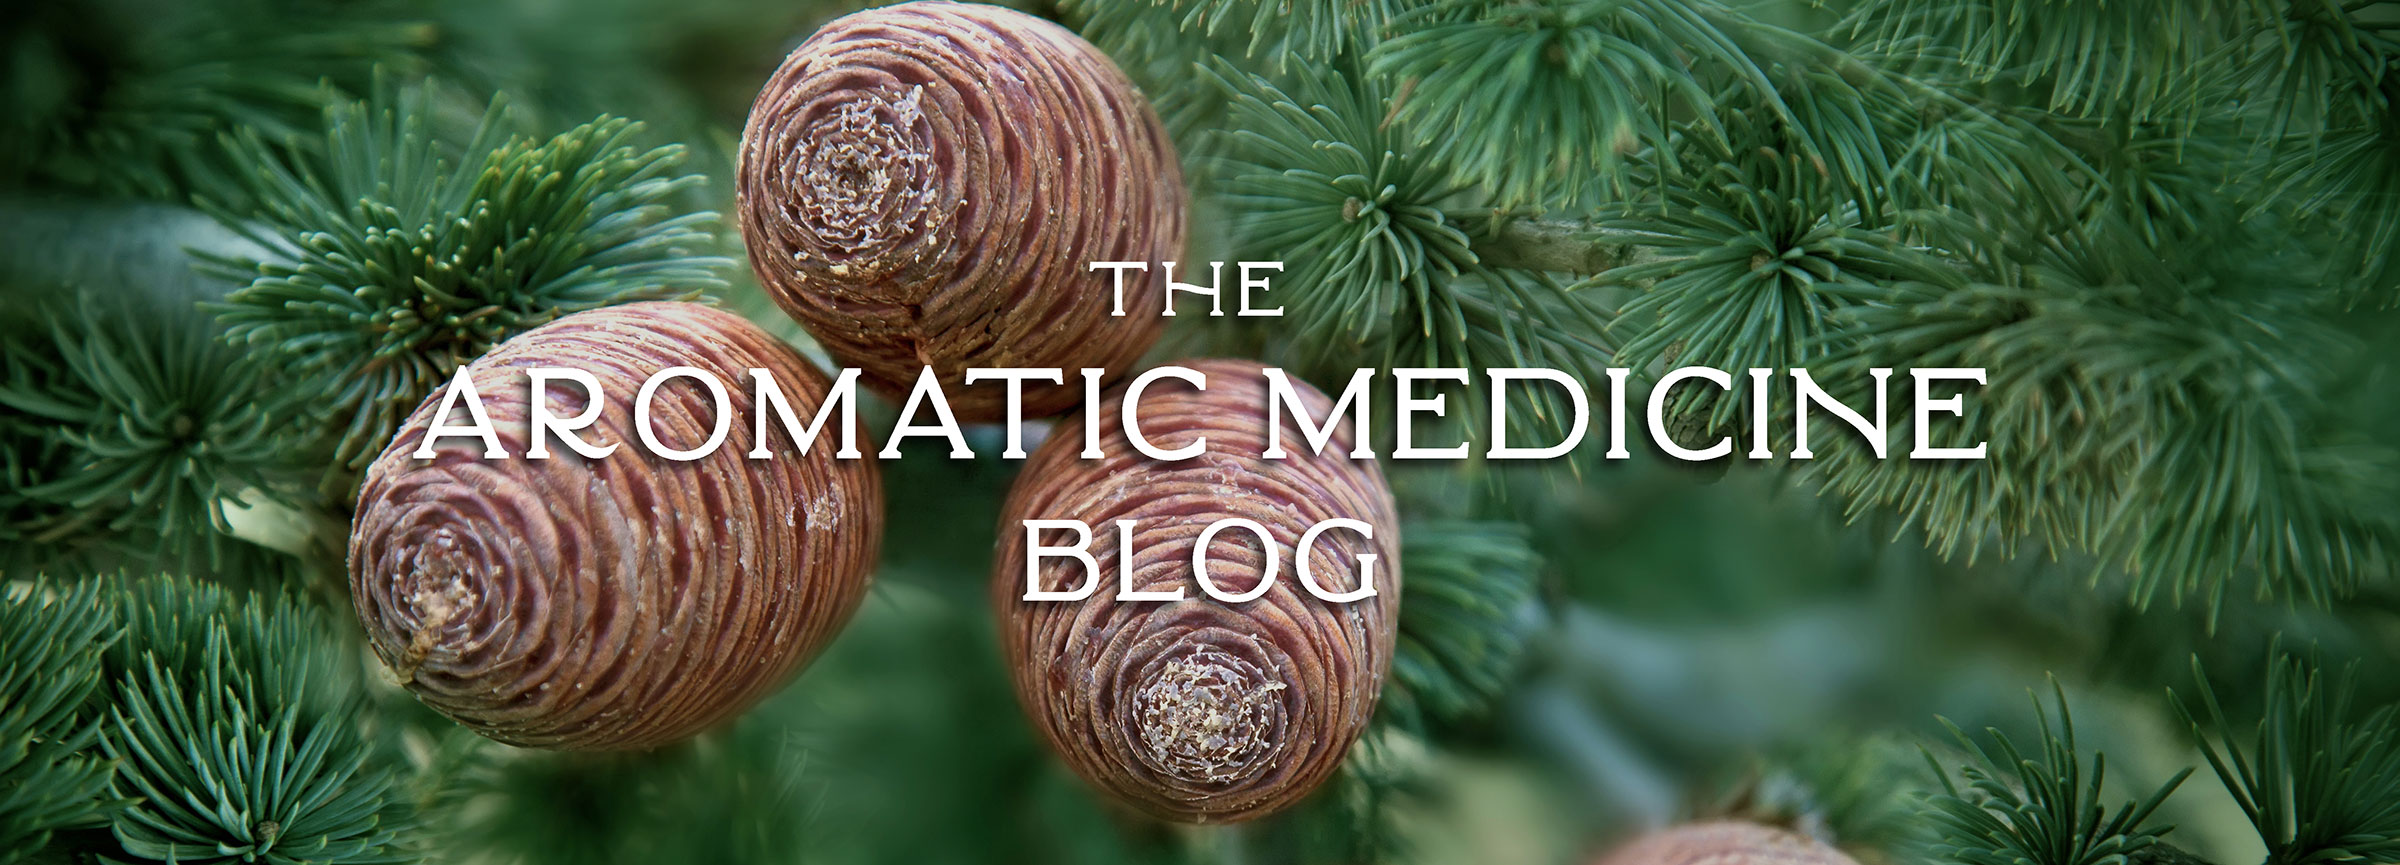 The Aromatic Medicine School Blog